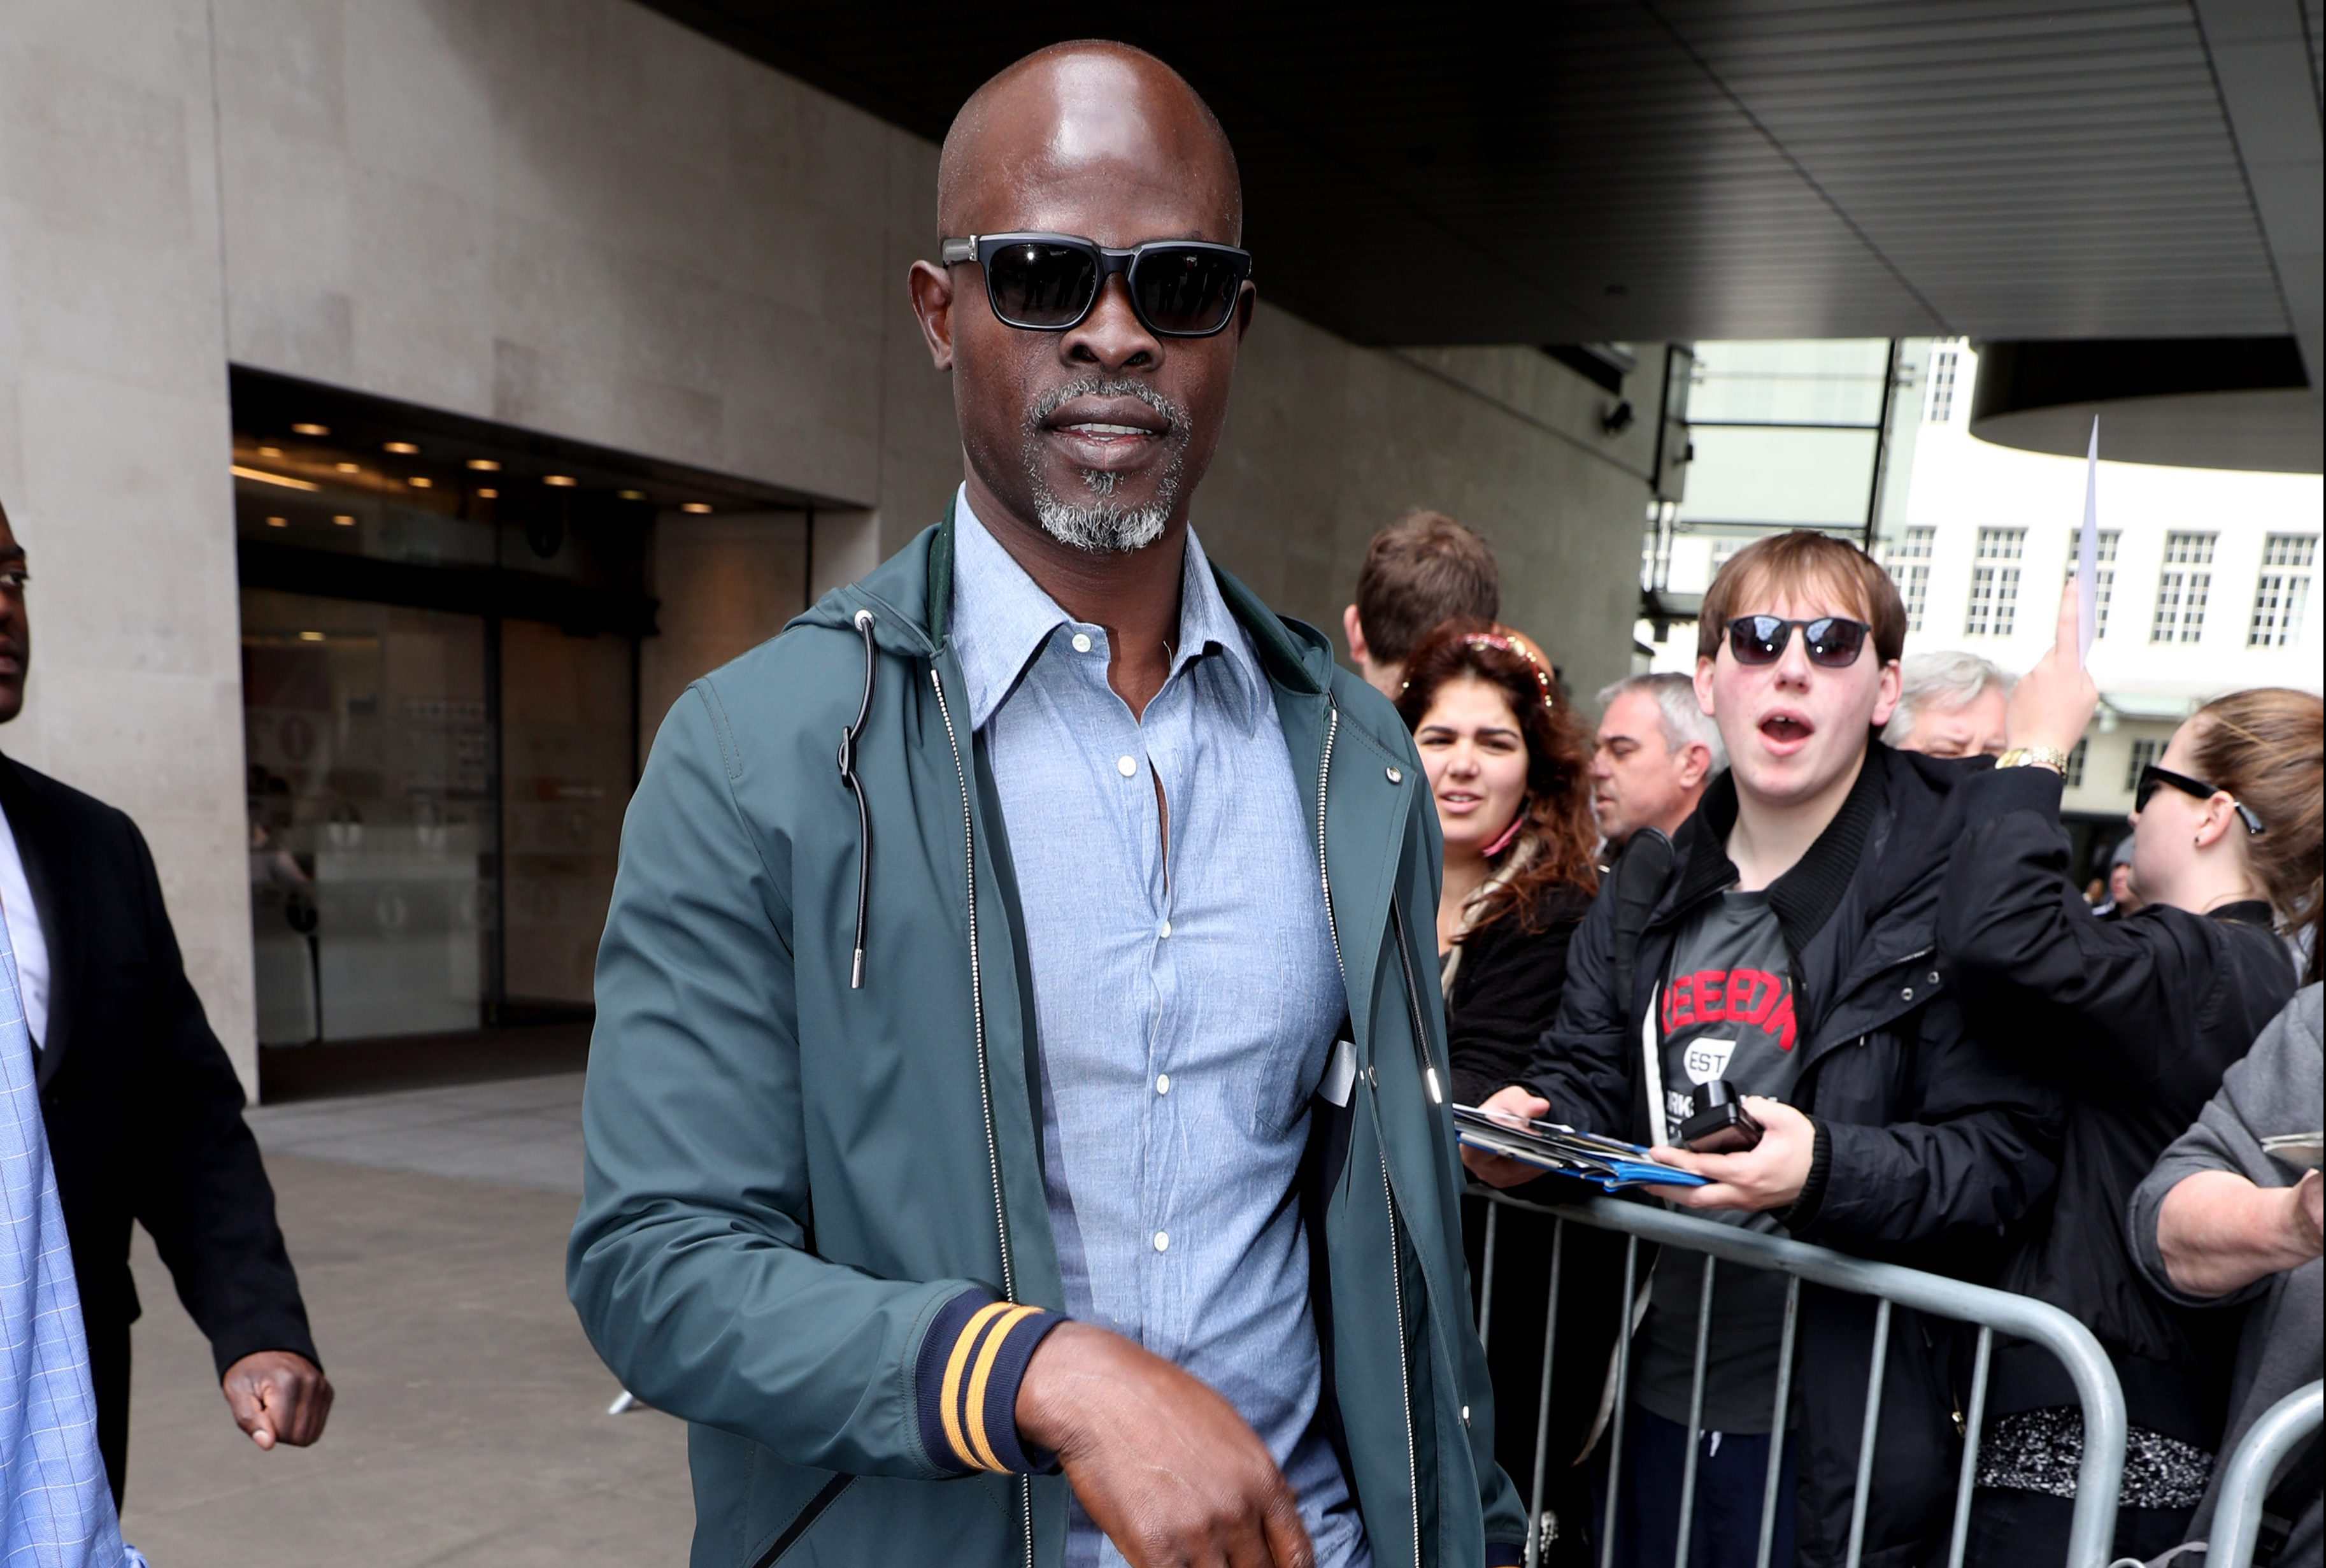 London Celebrity Sightings - July 5, 2015